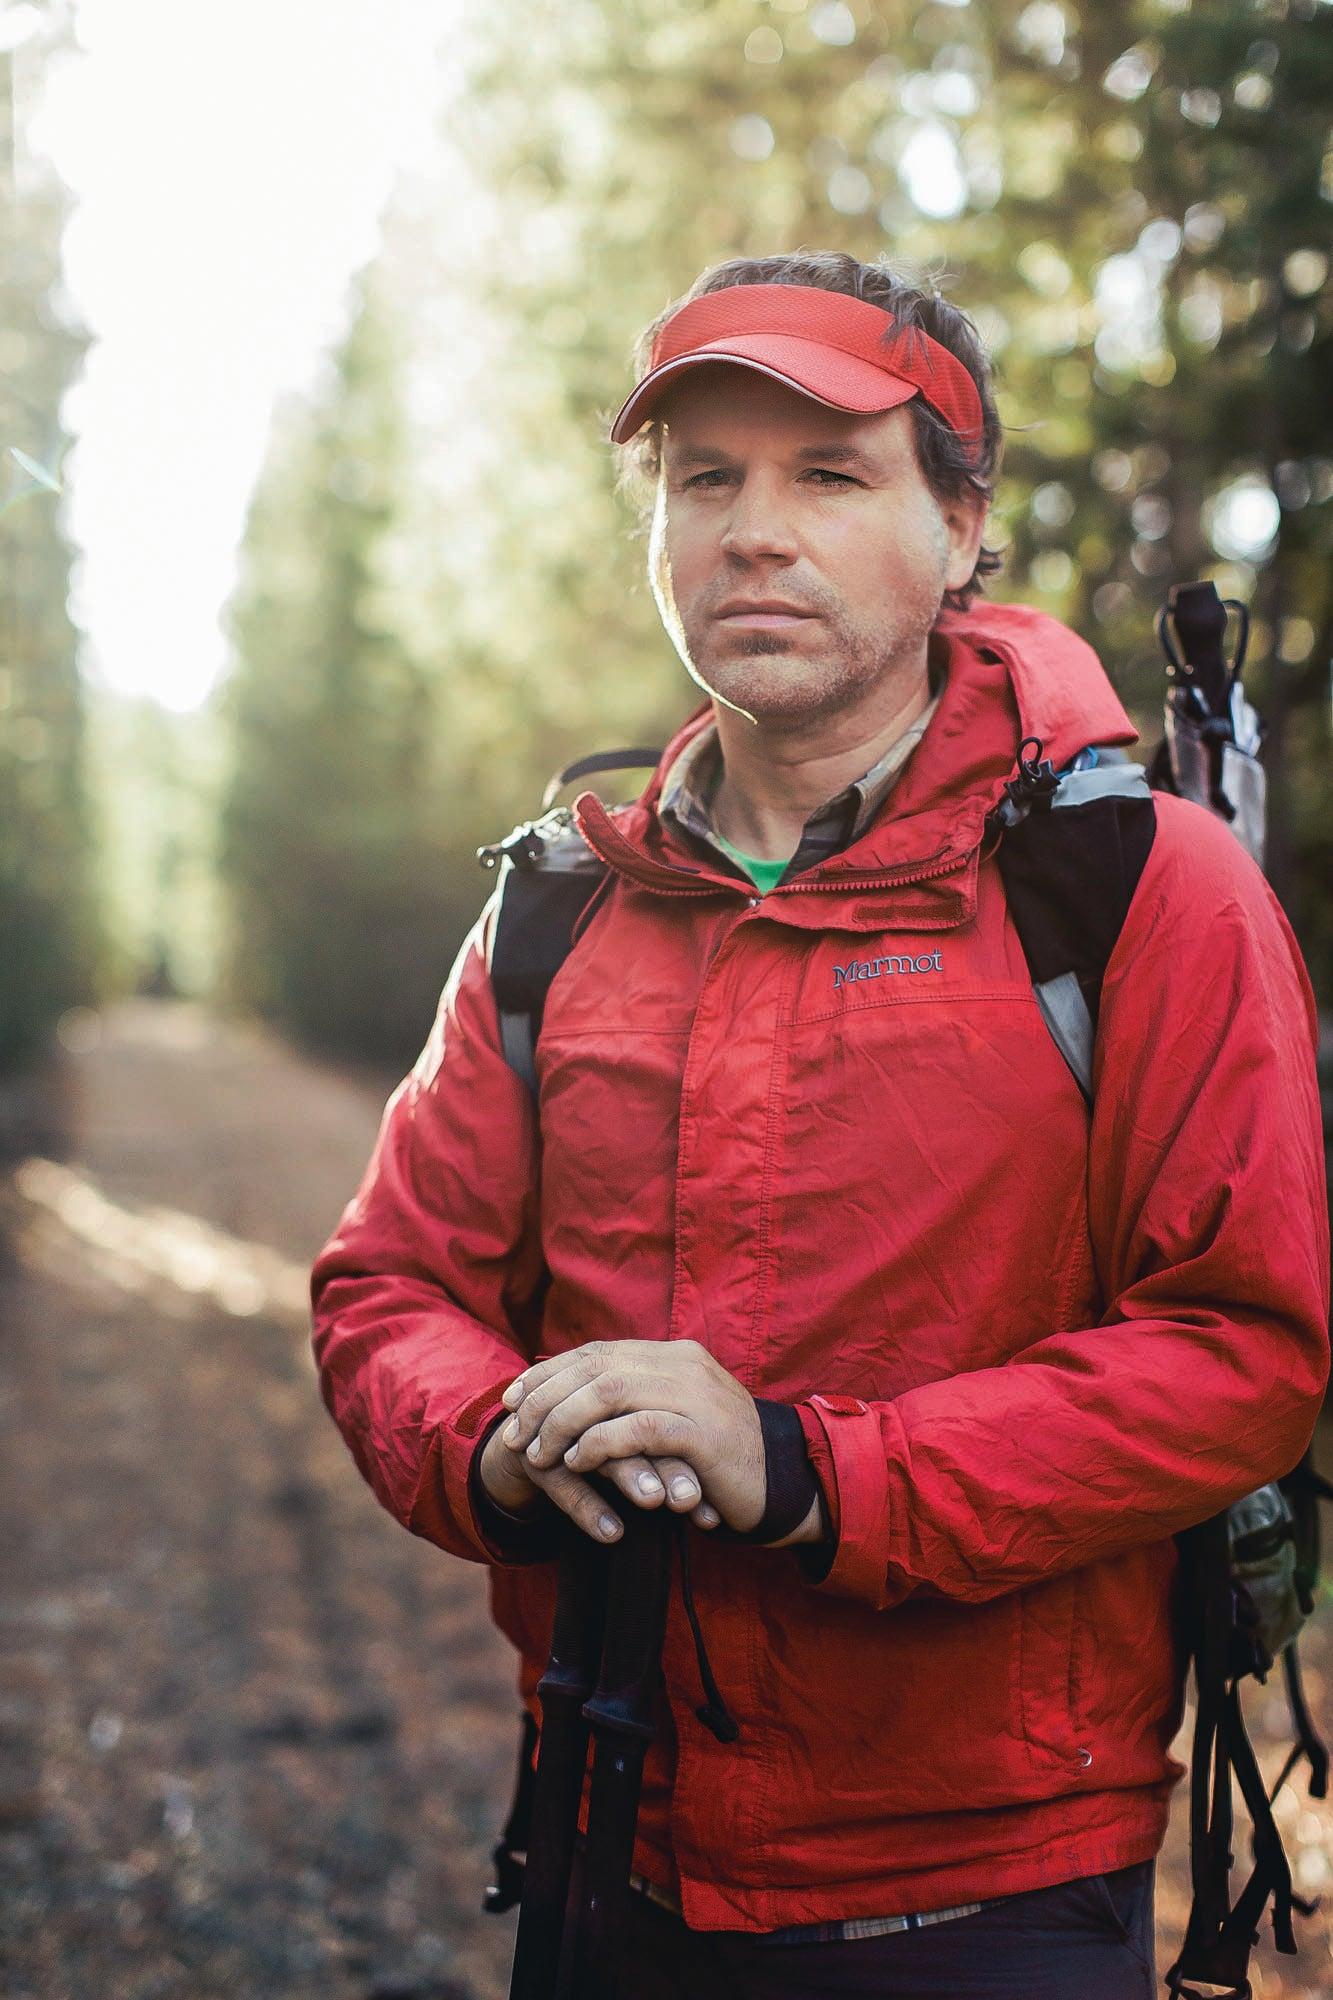 Portrait of hiker Rue McKenrick